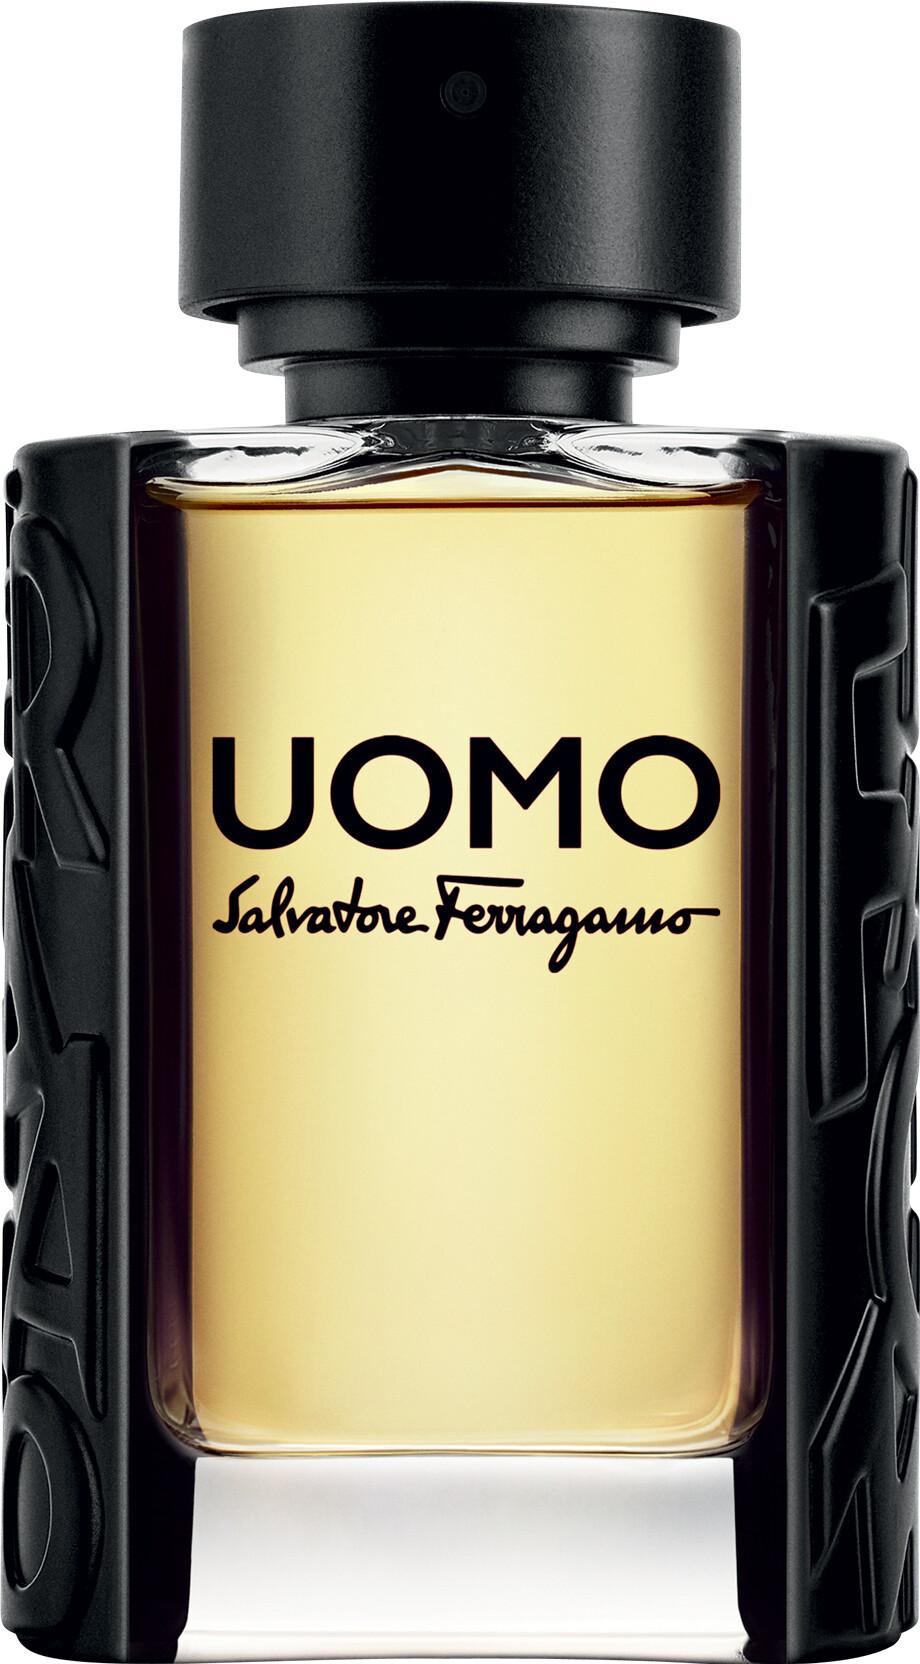 ... Salvatore Ferragamo Uomo Eau de Toilette Spray 30ml ... 95cbd9f090